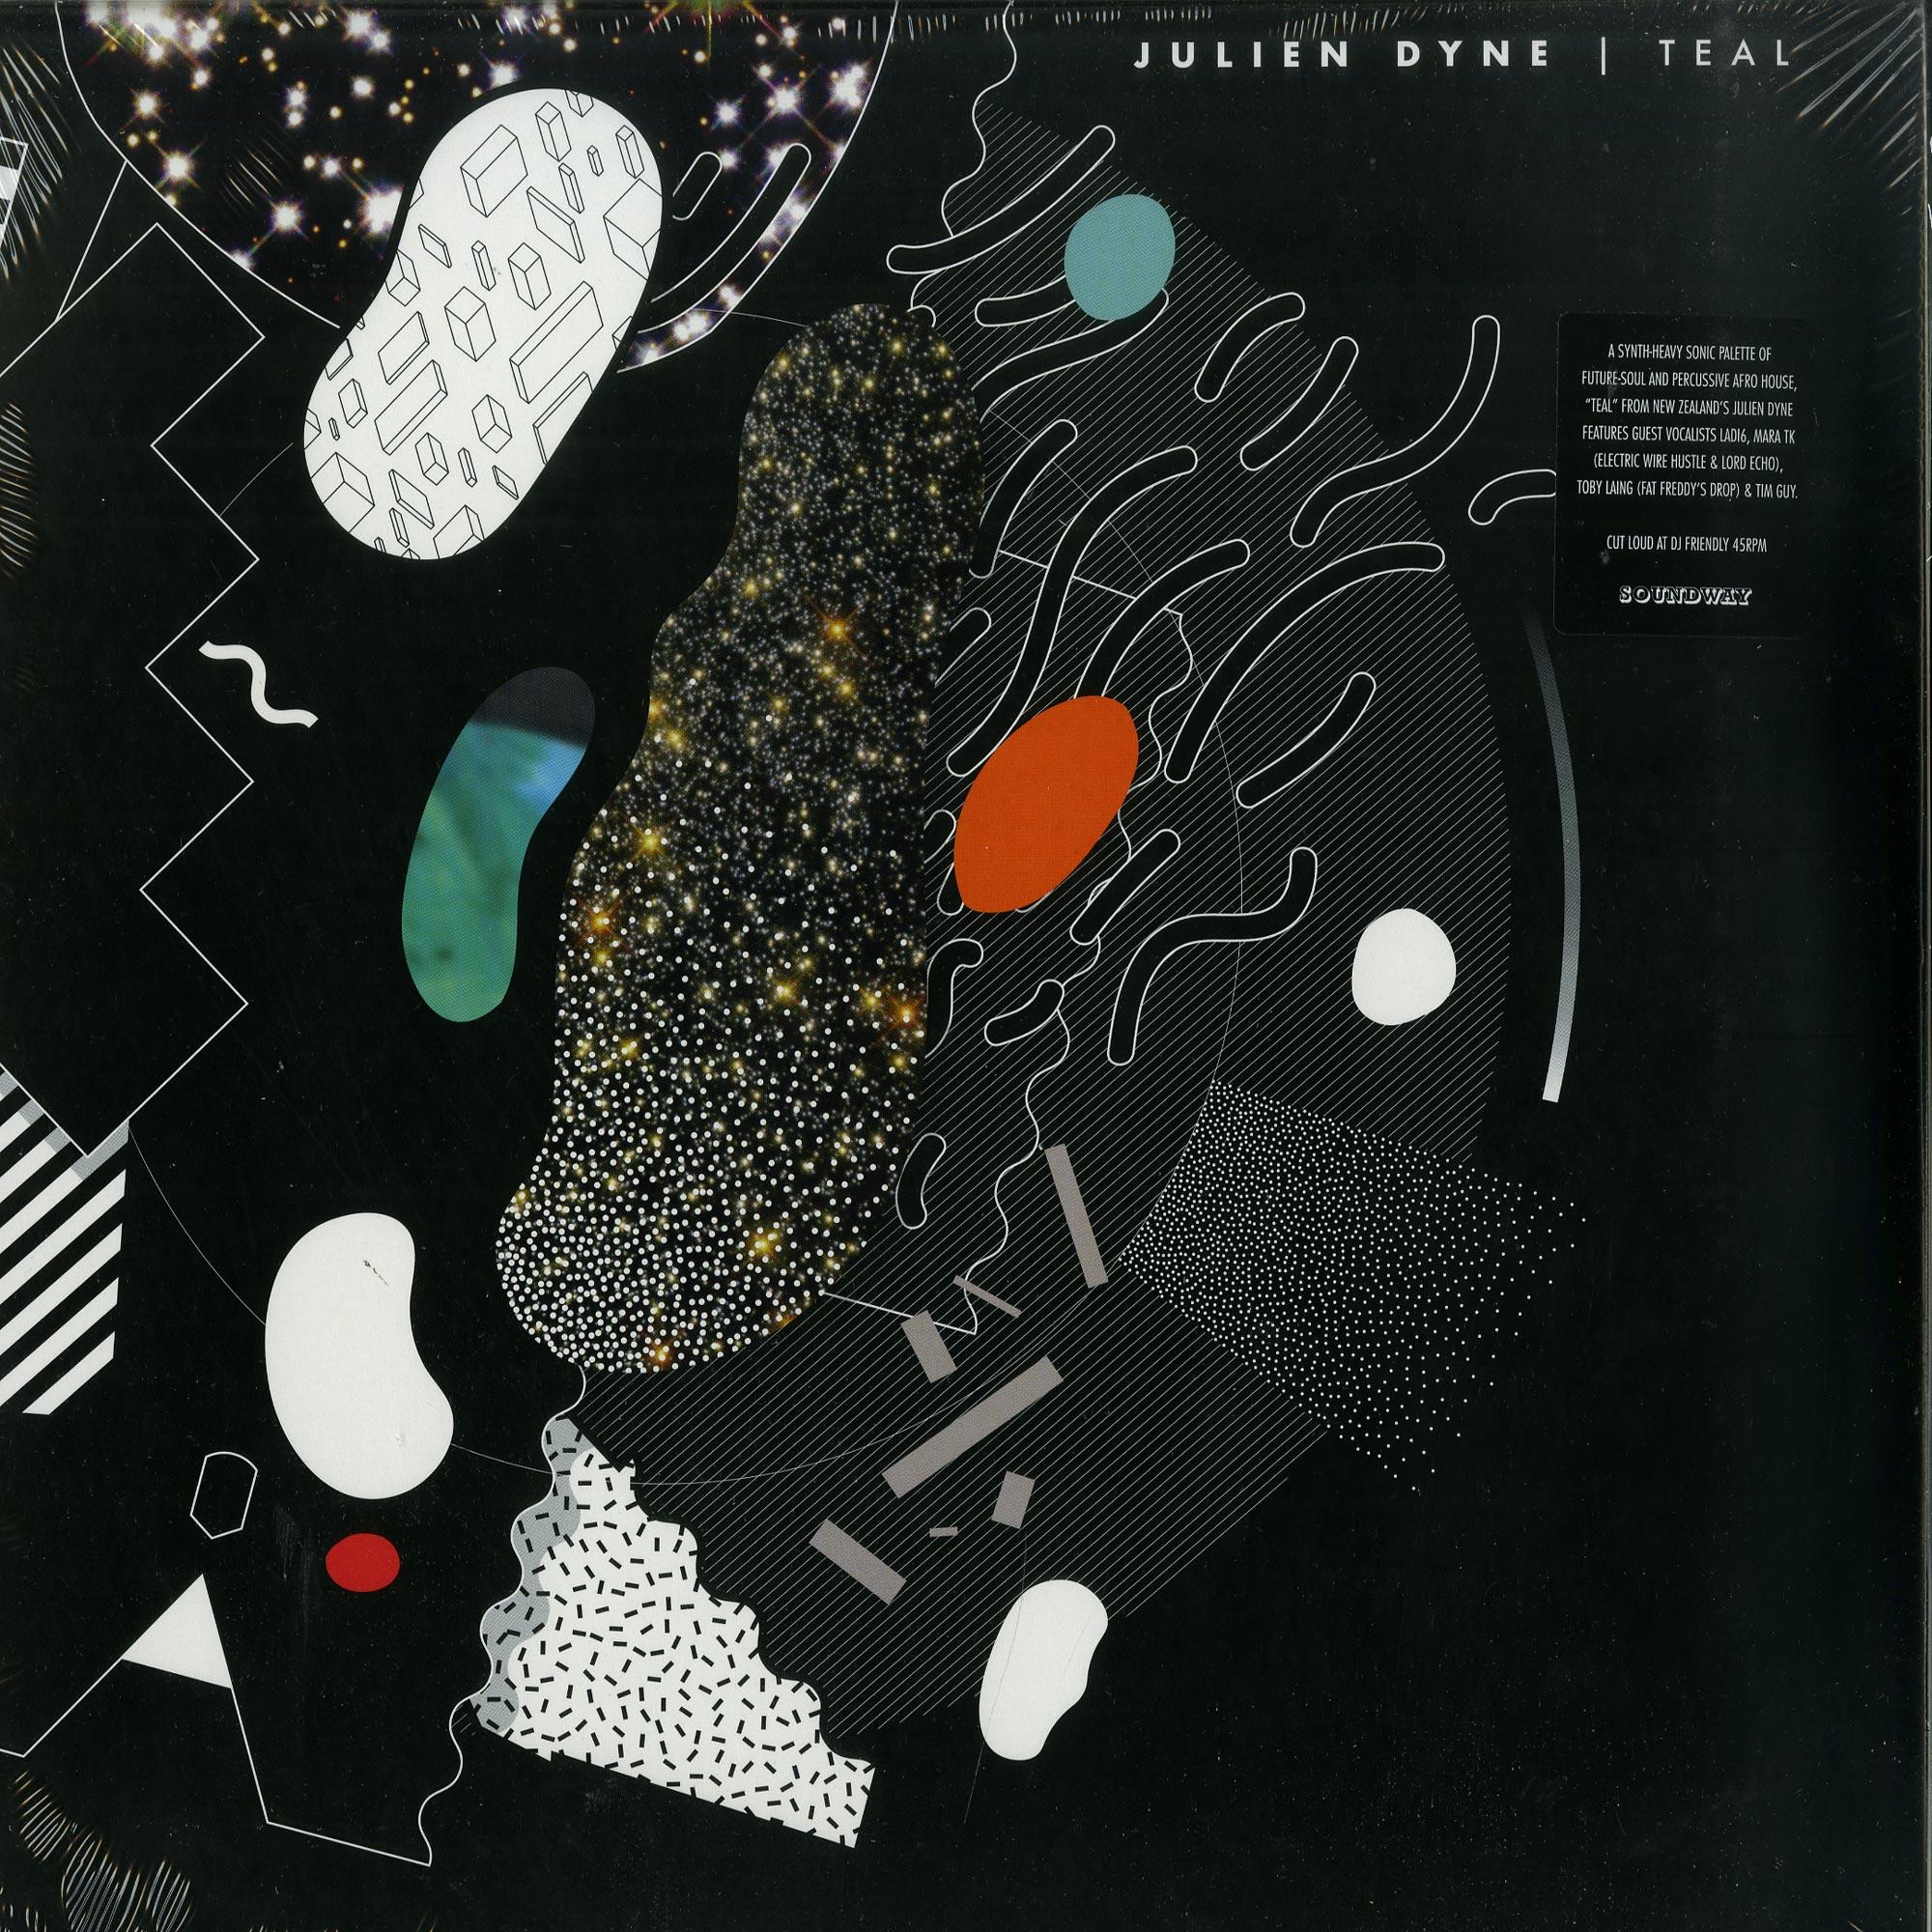 Julien Dyne - TEAL